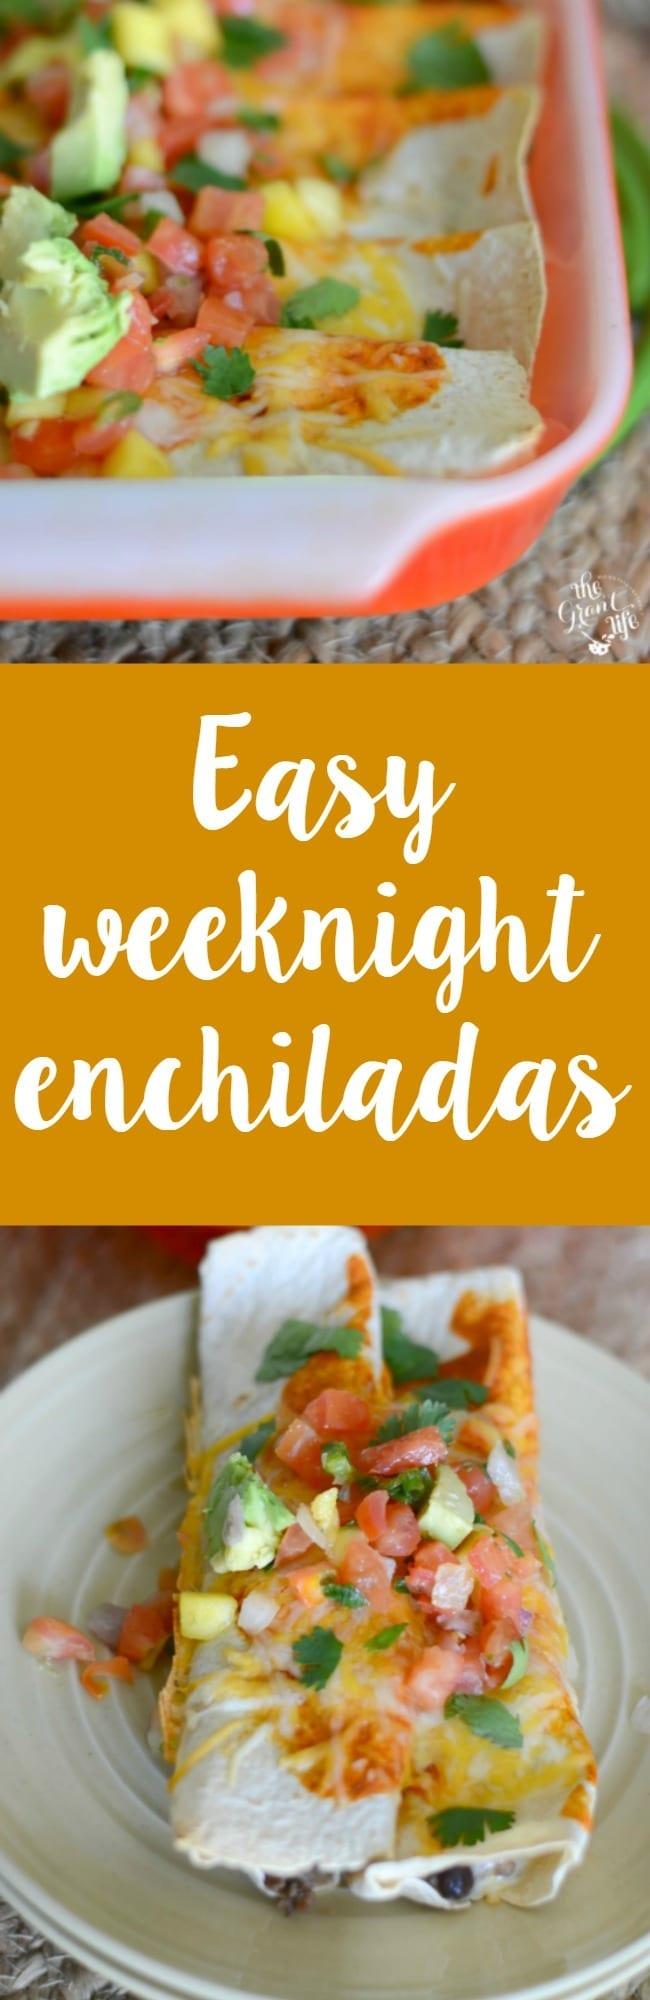 Easy weeknight enchilada recipe!  Make these yummy enchiladas super quick